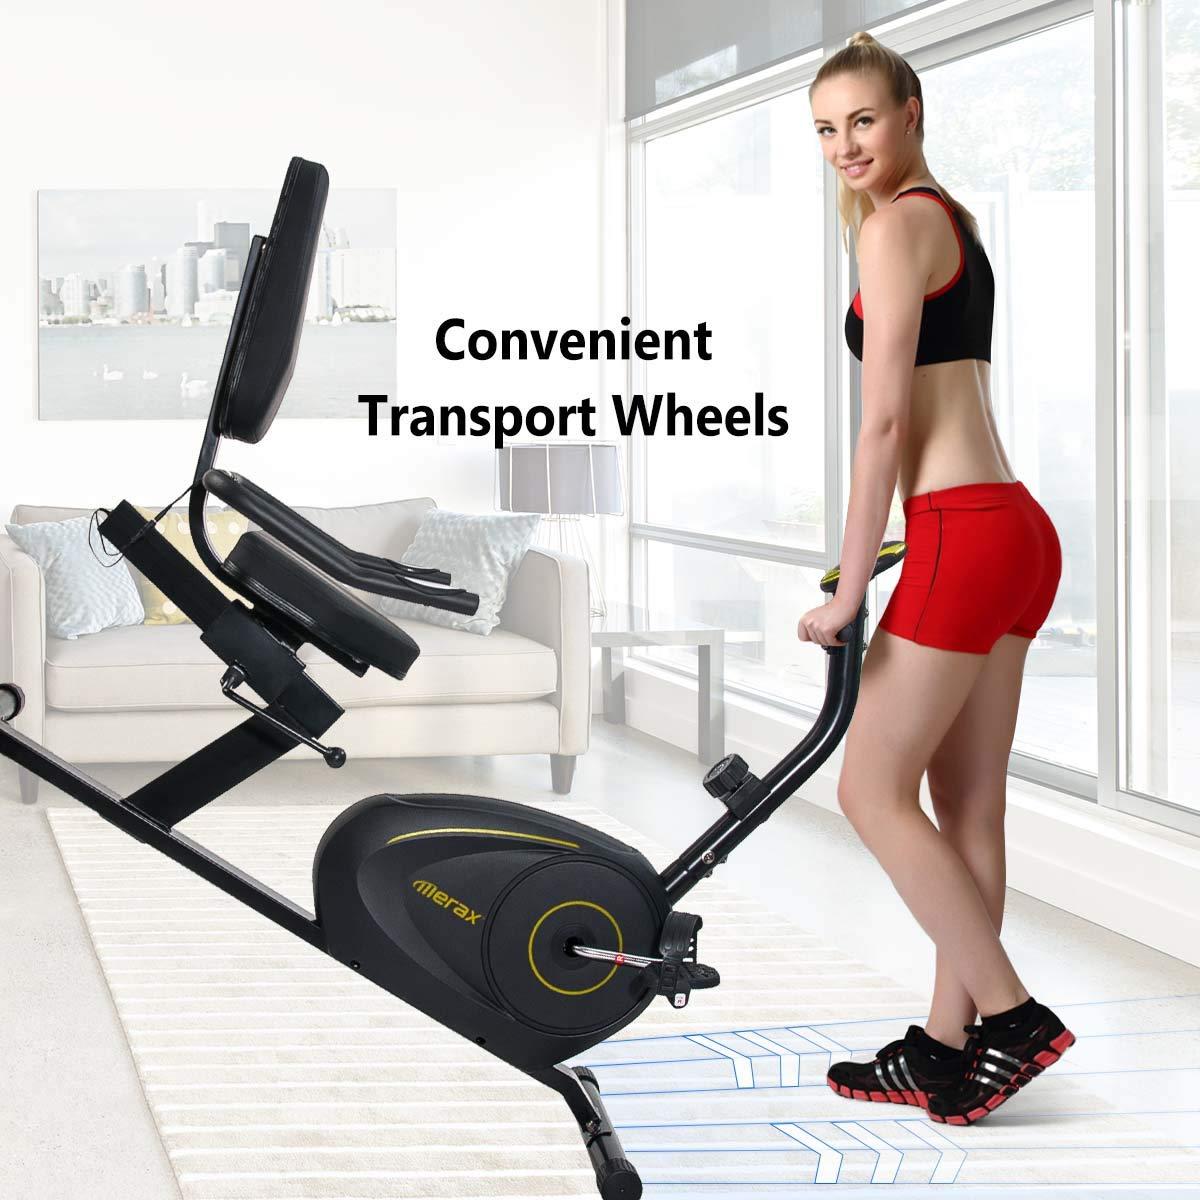 Merax Magnetic Recumbent Exercise Bike | 8-Level Resistance | Quick Adjust Seat (Black/Yellow) by Merax (Image #5)